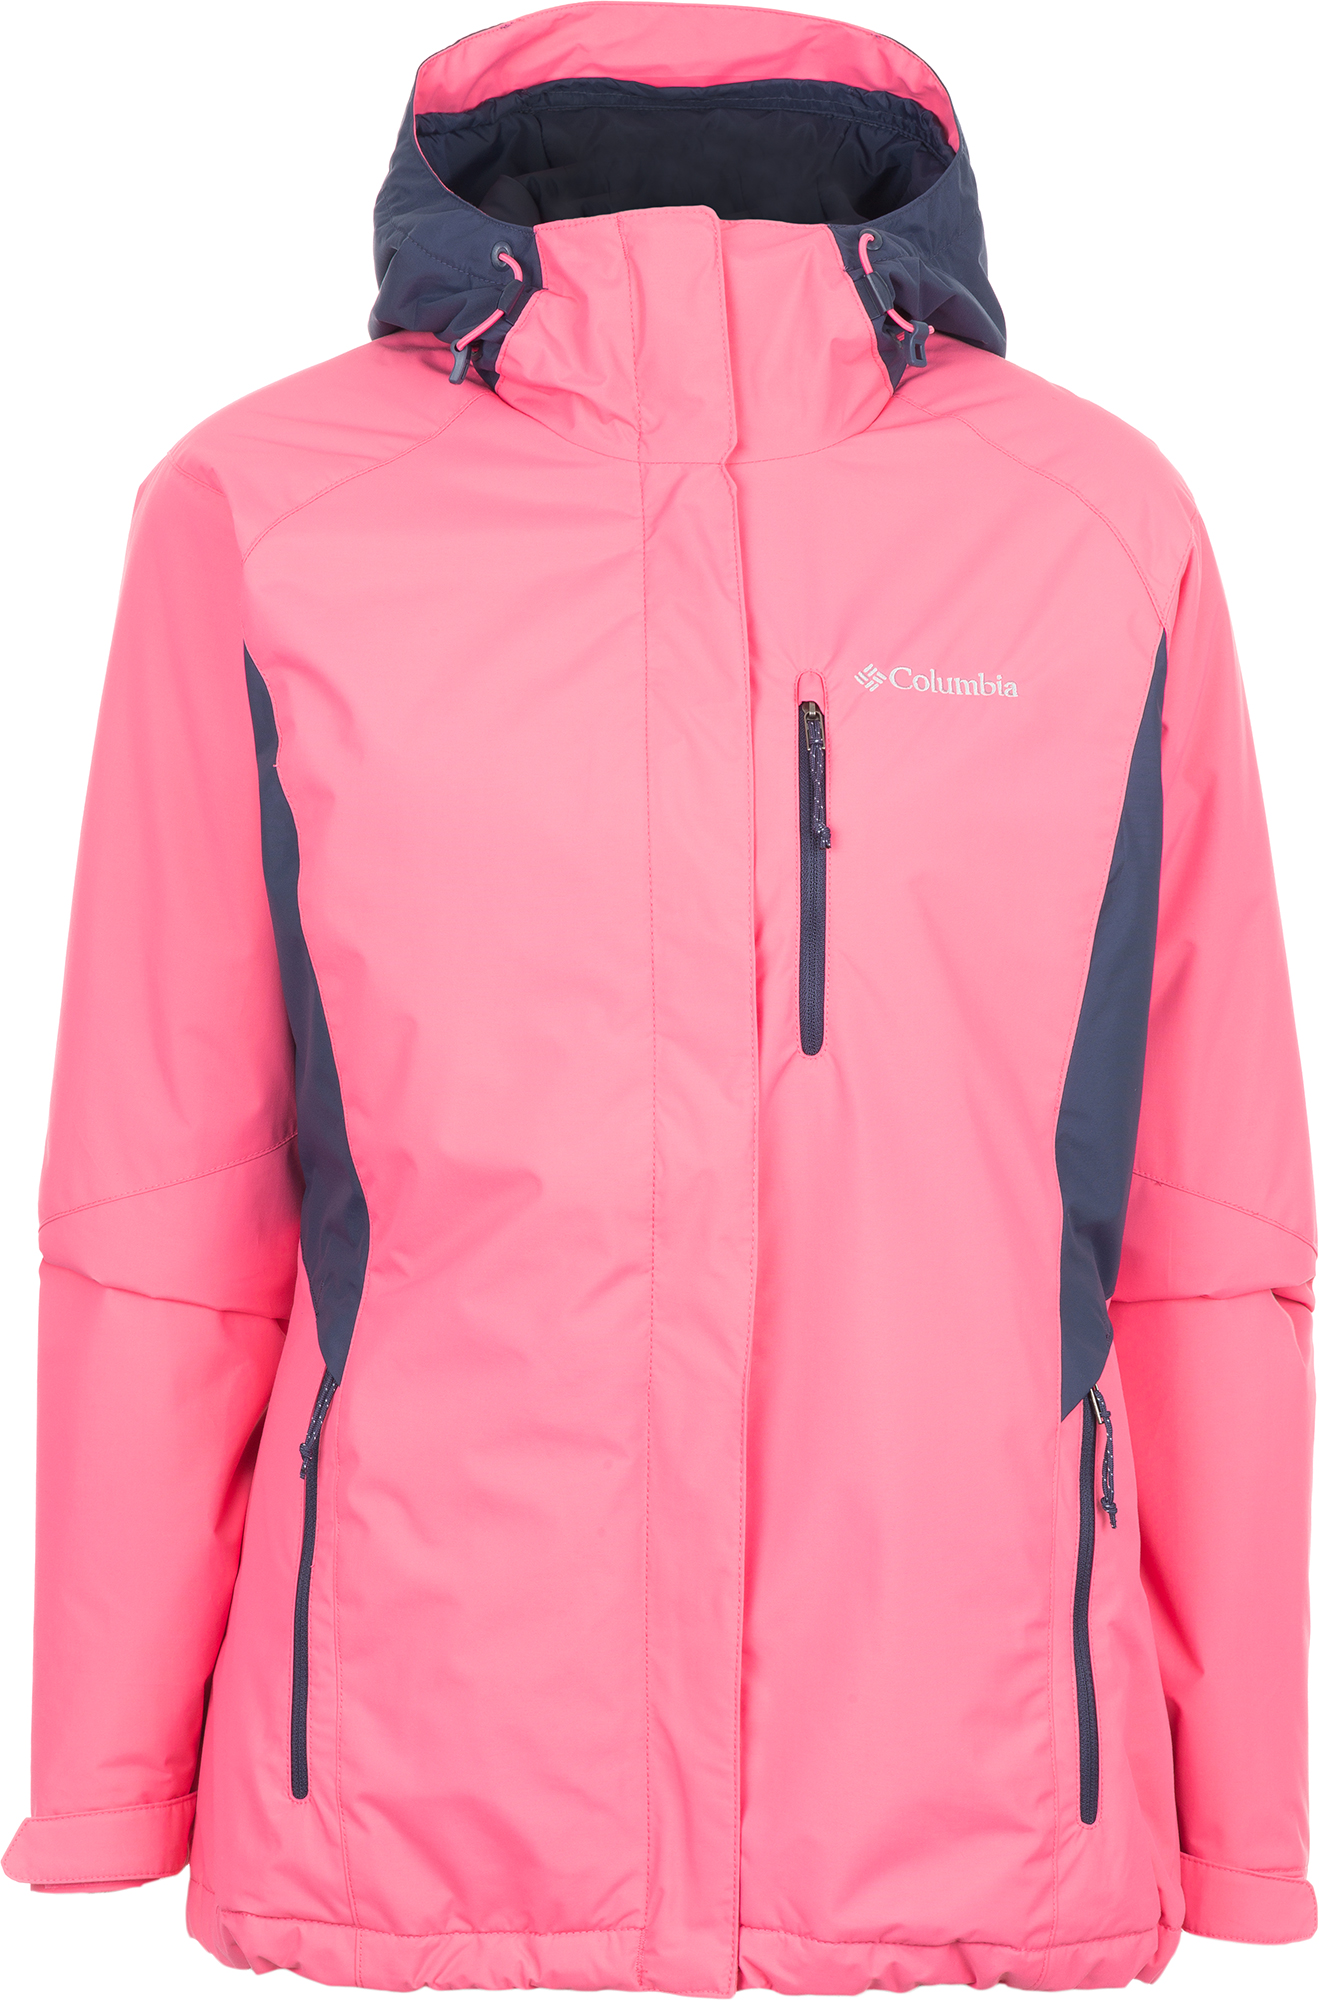 Columbia Куртка утепленная женская Columbia Montague Pines, размер 42